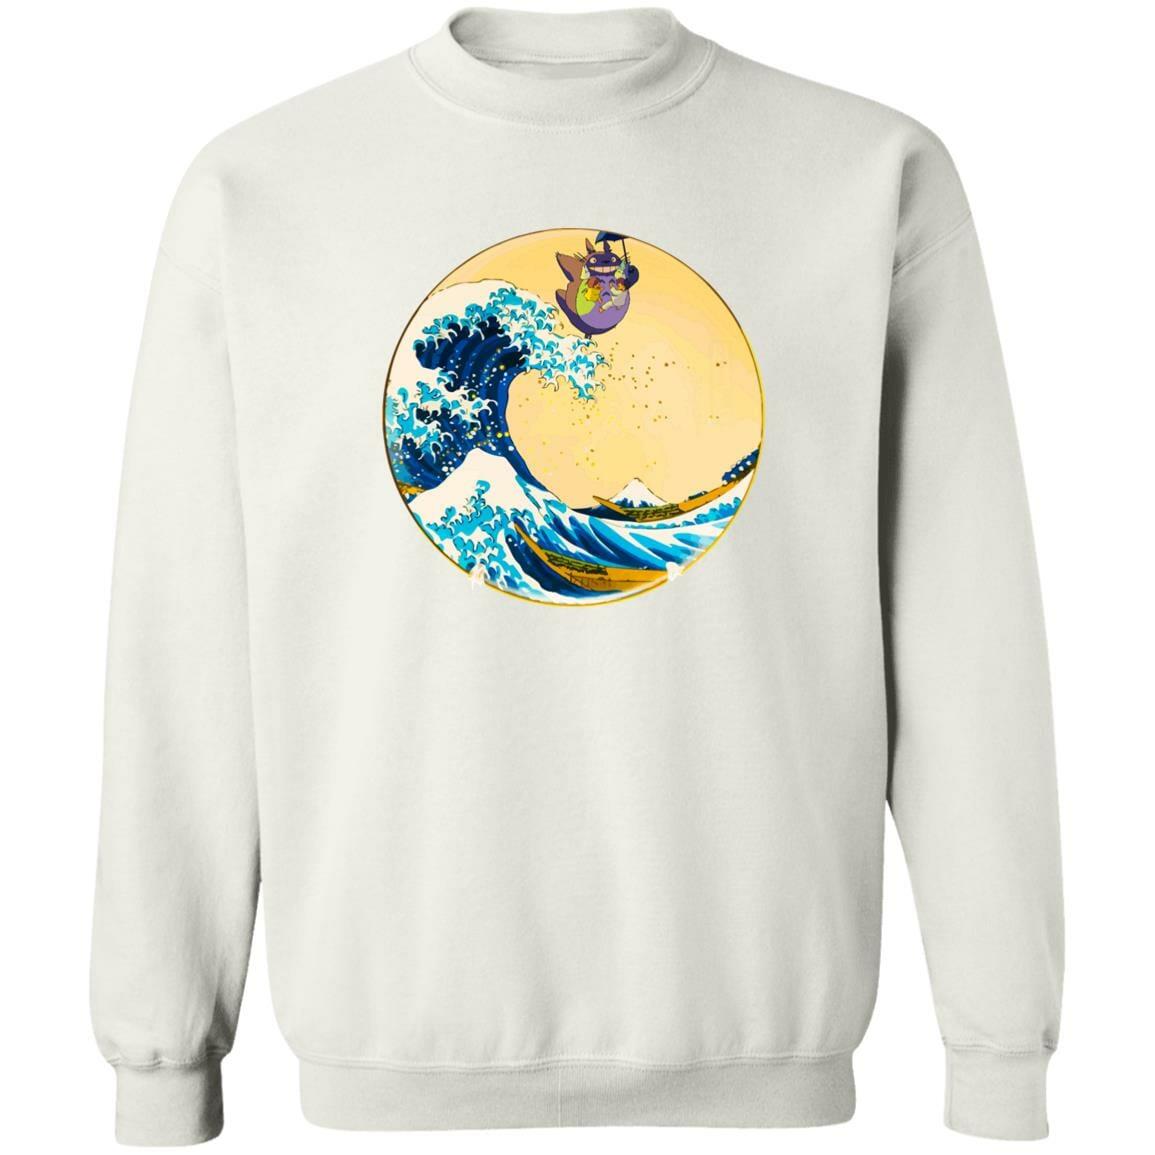 Totoro On The Waves Sweatshirt Unisex